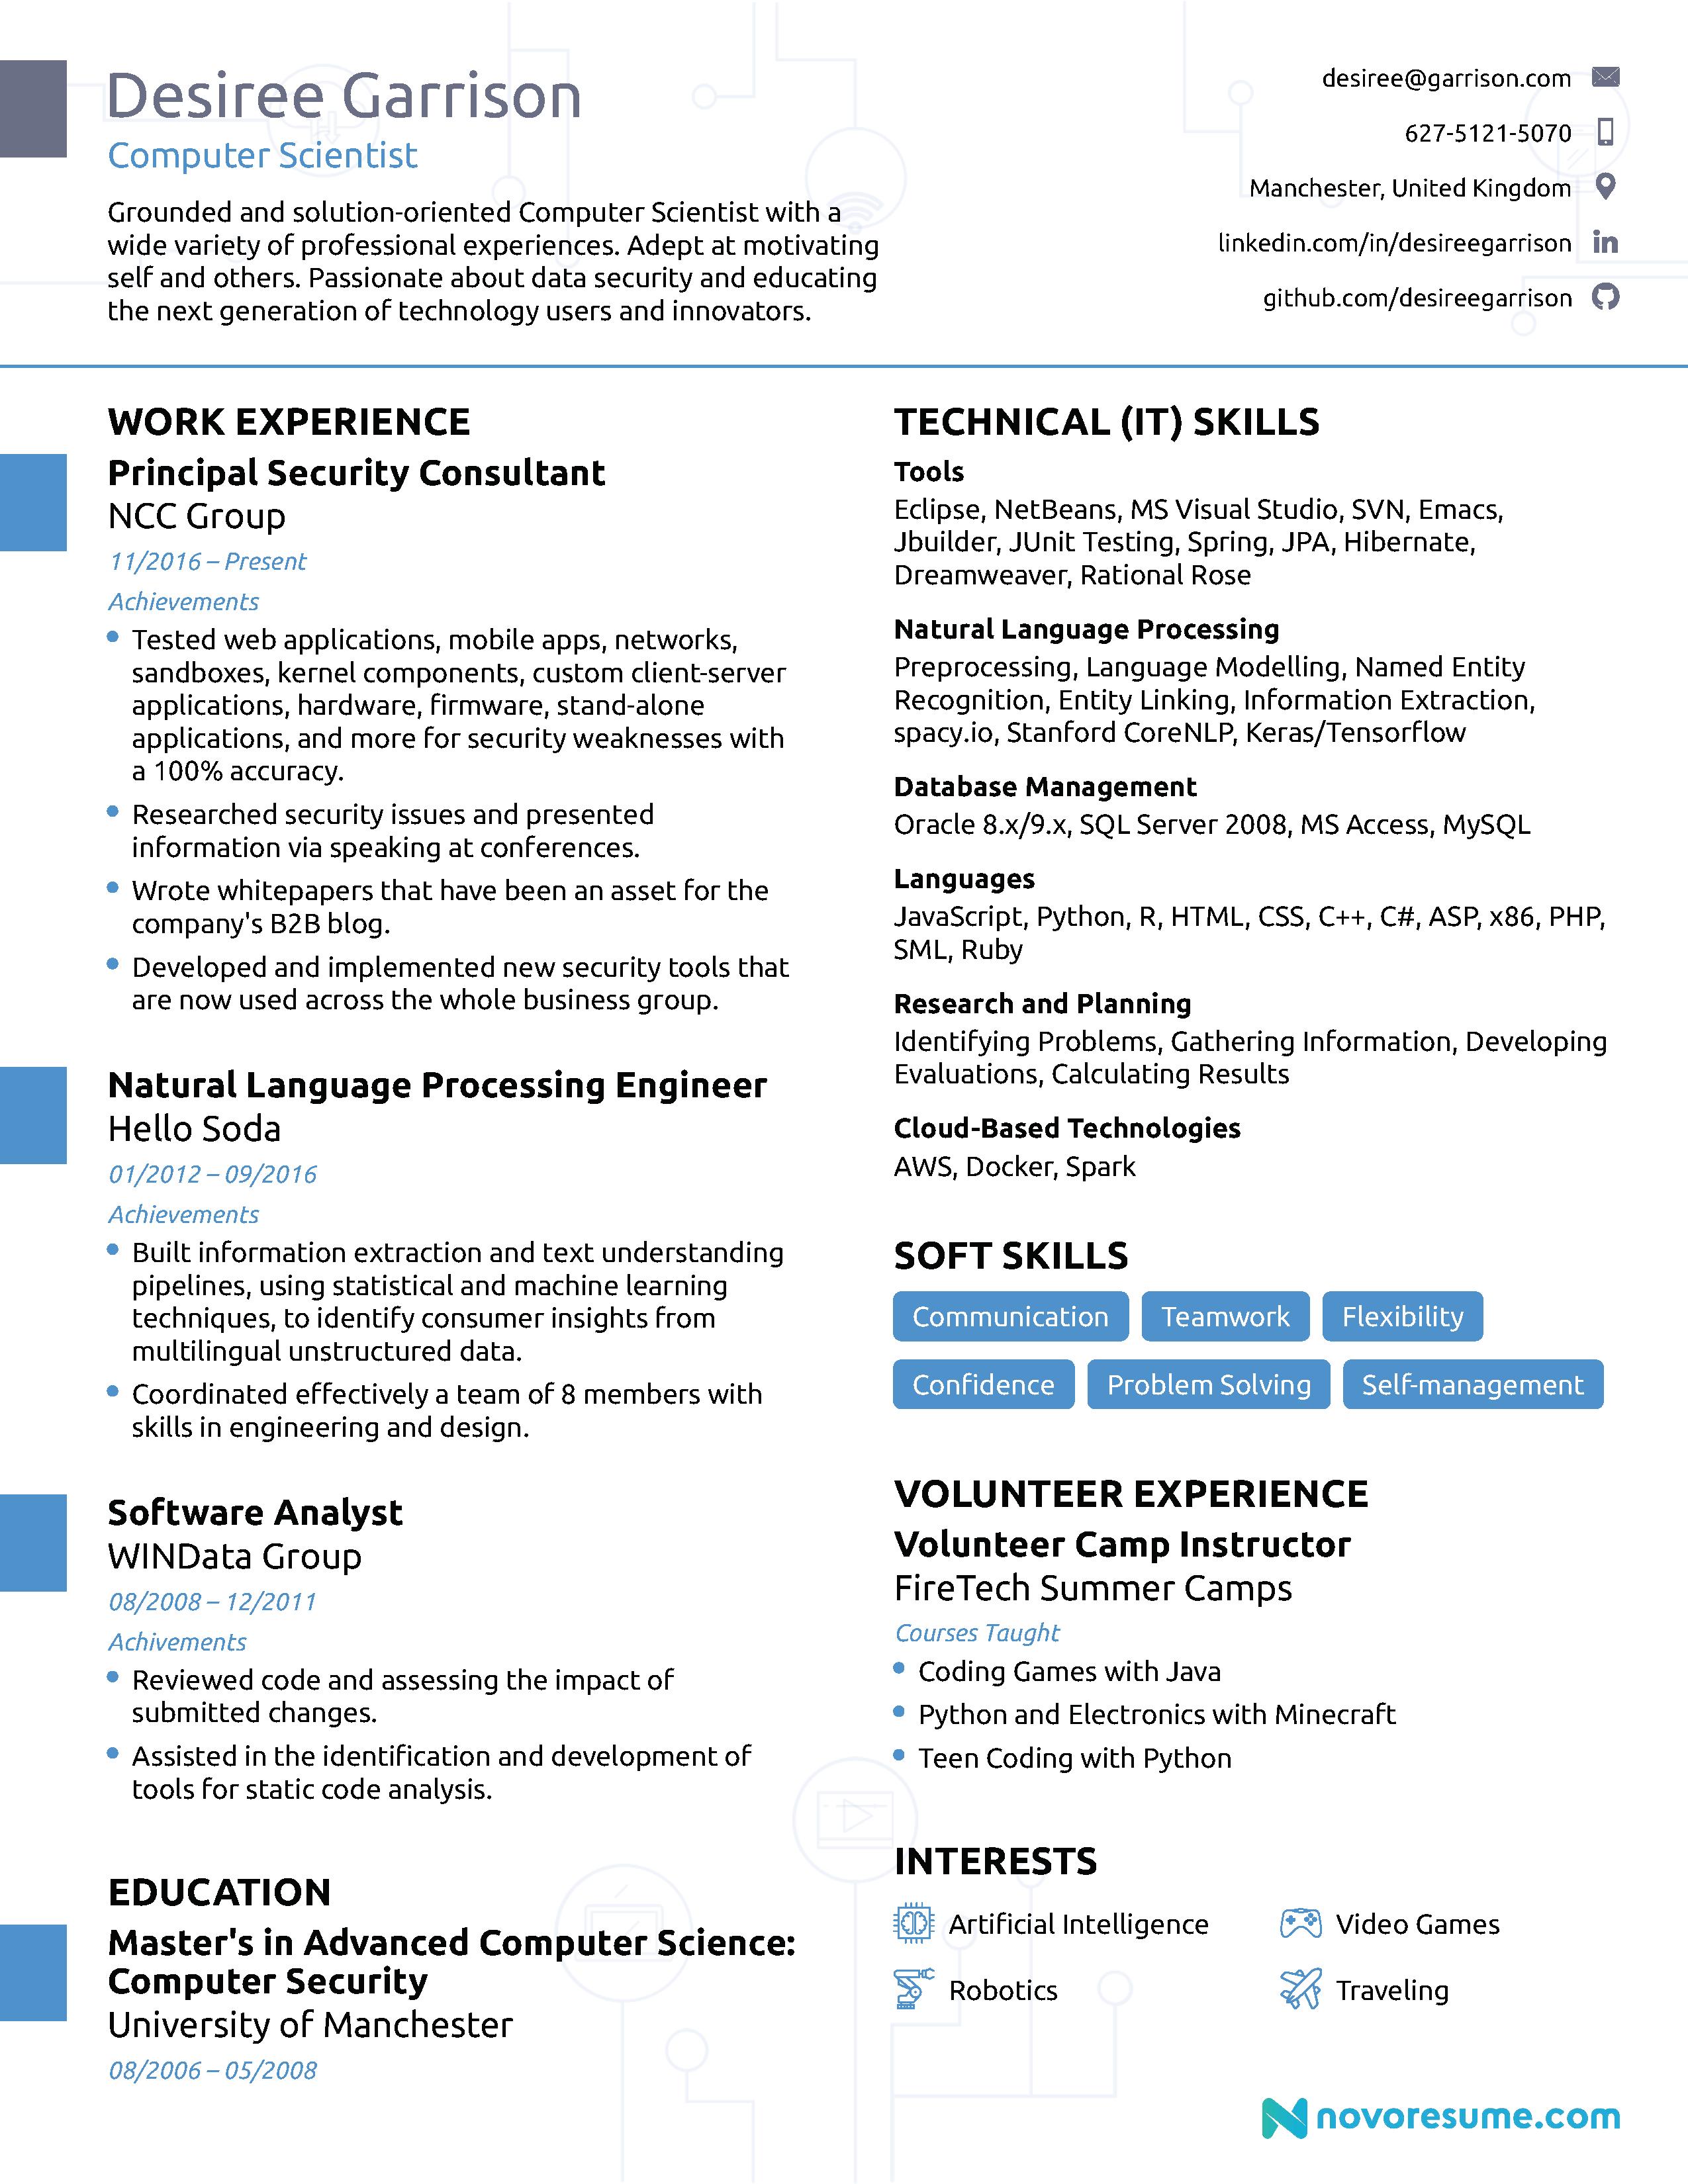 Computer Science Computer skills resume, Professional